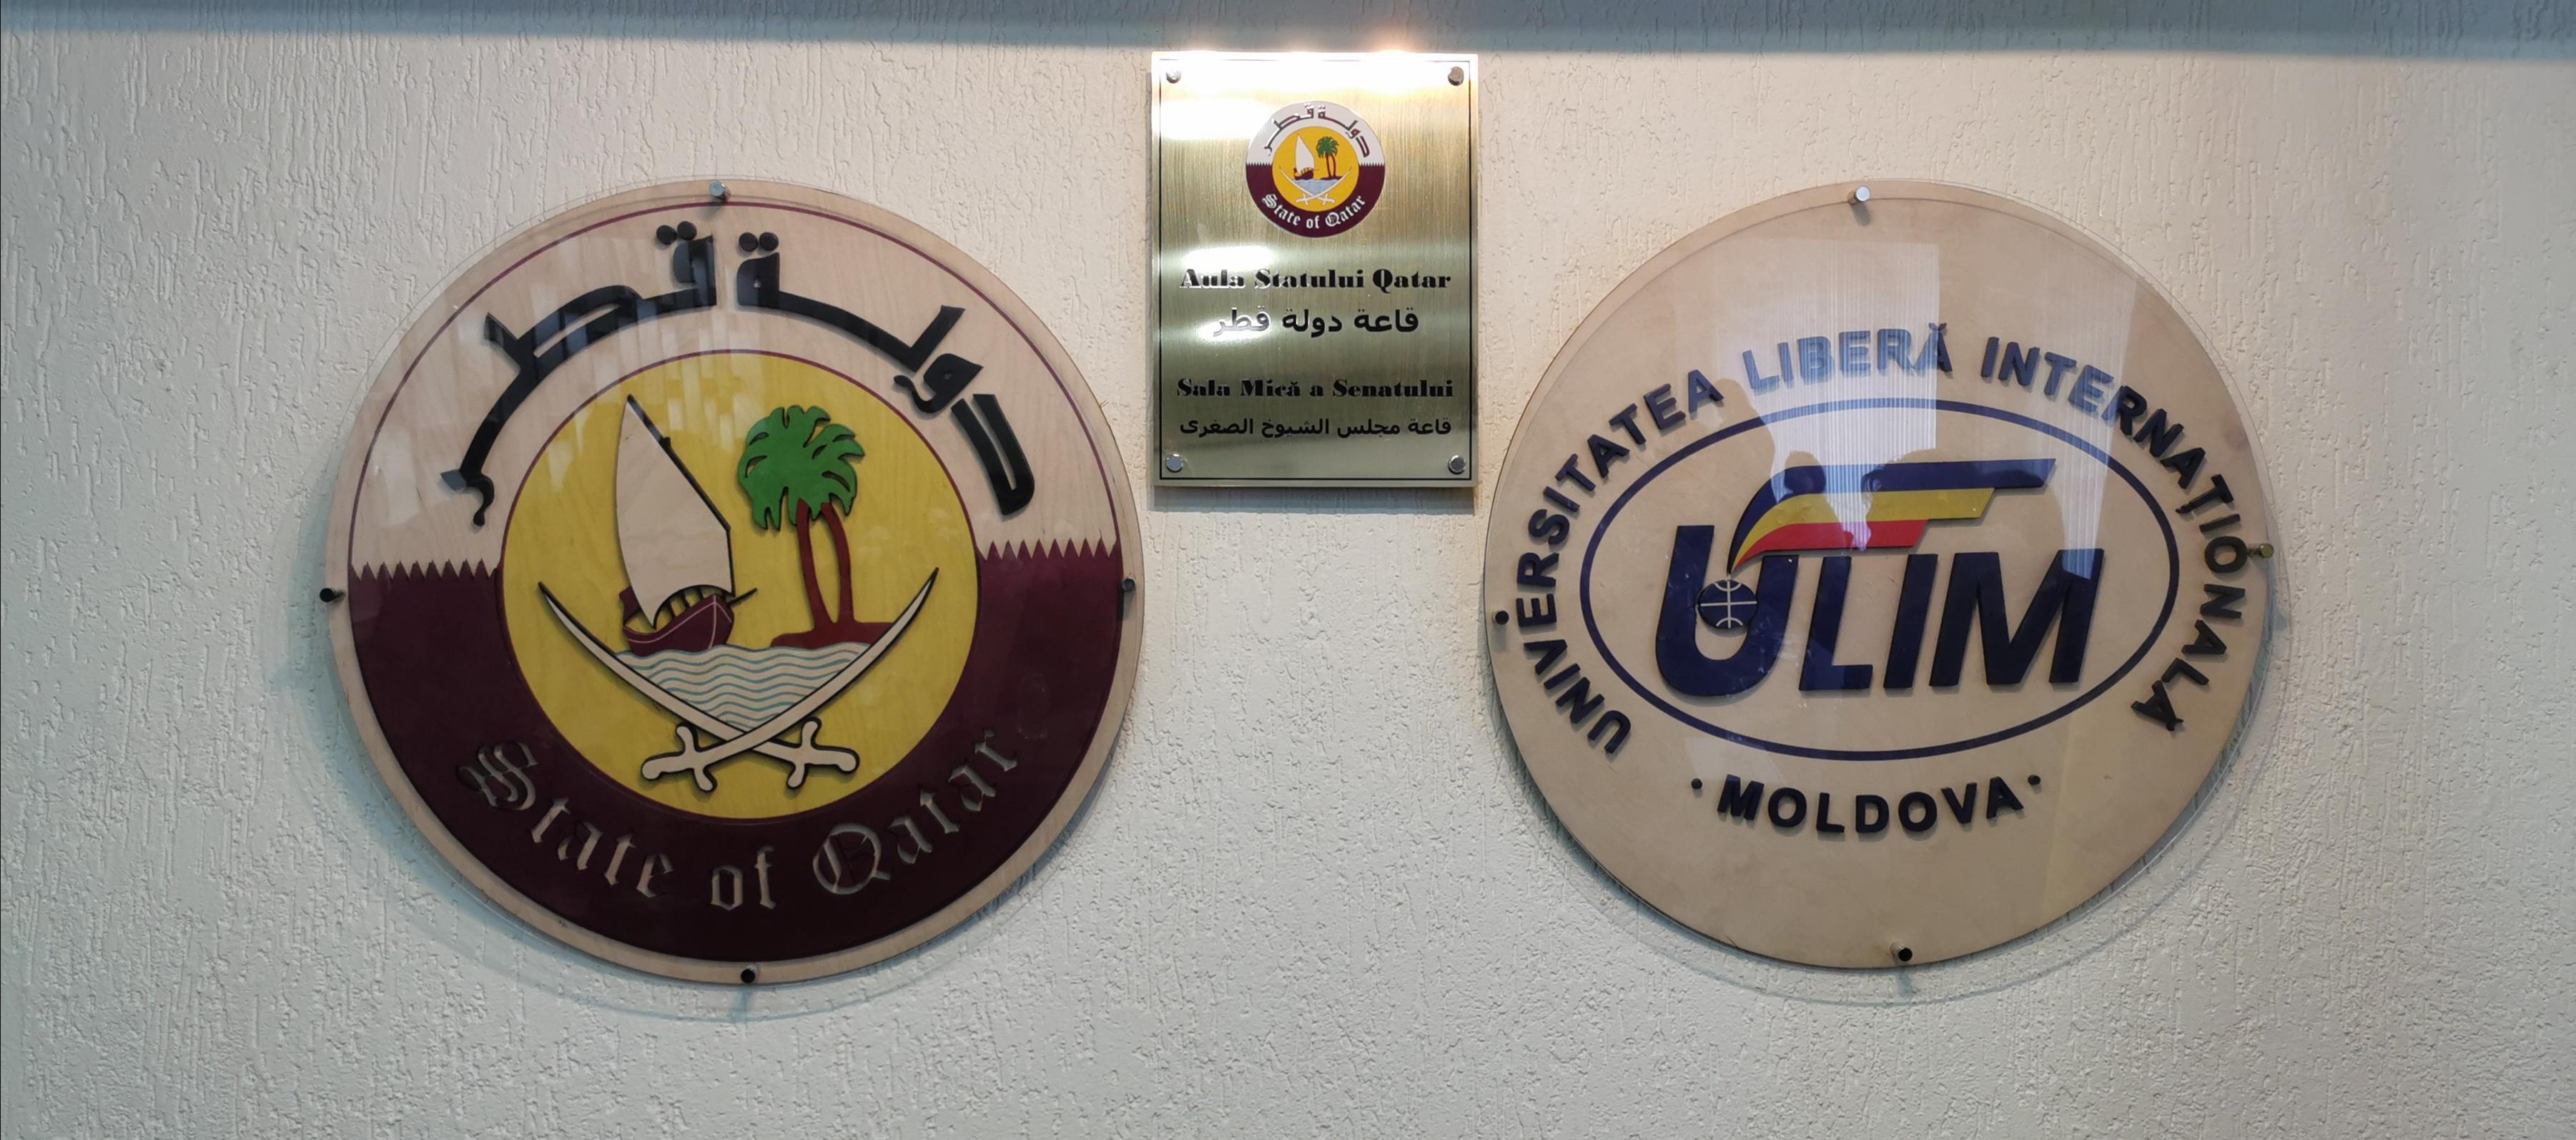 Inaugurarea Aulei Statului Qatar la ULIM